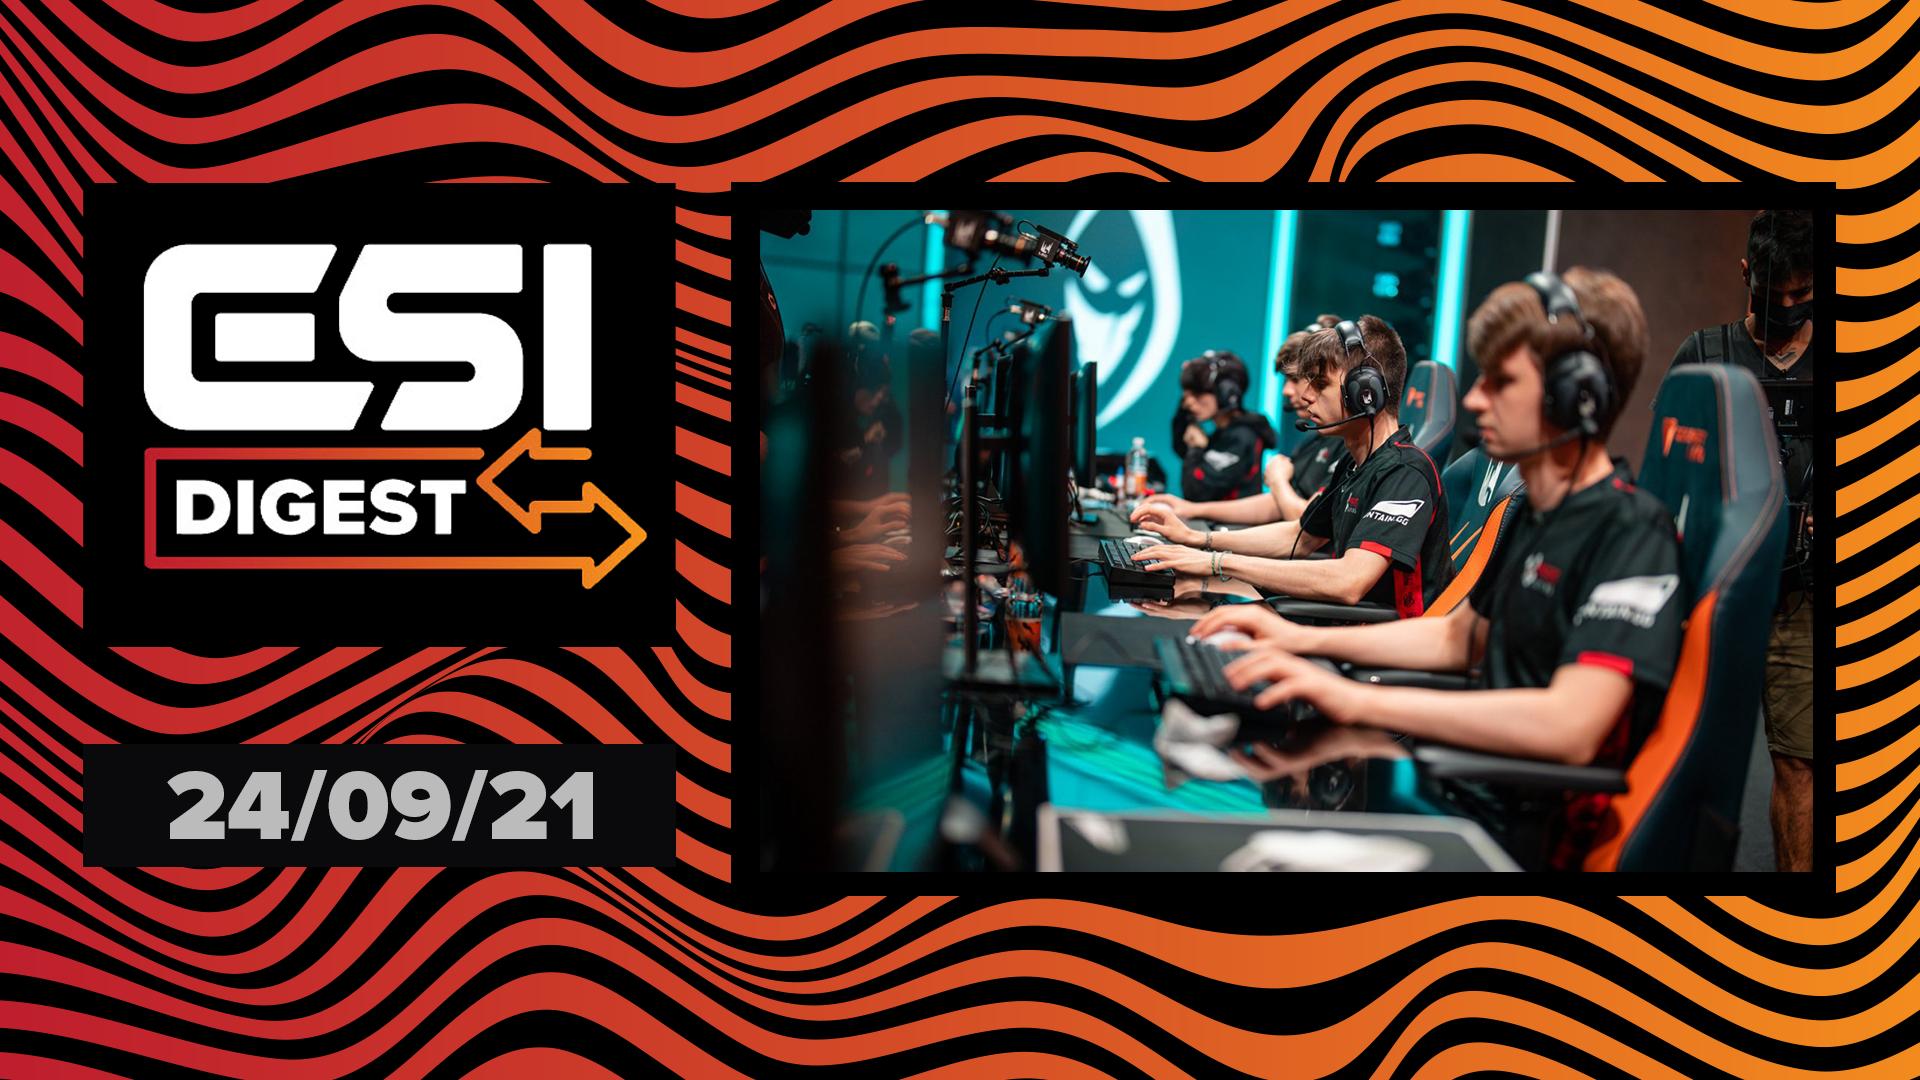 ESI London returns, Misfits raises $35m, Fnatic gets jersey sponsor | ESI Digest #61 thumbnail